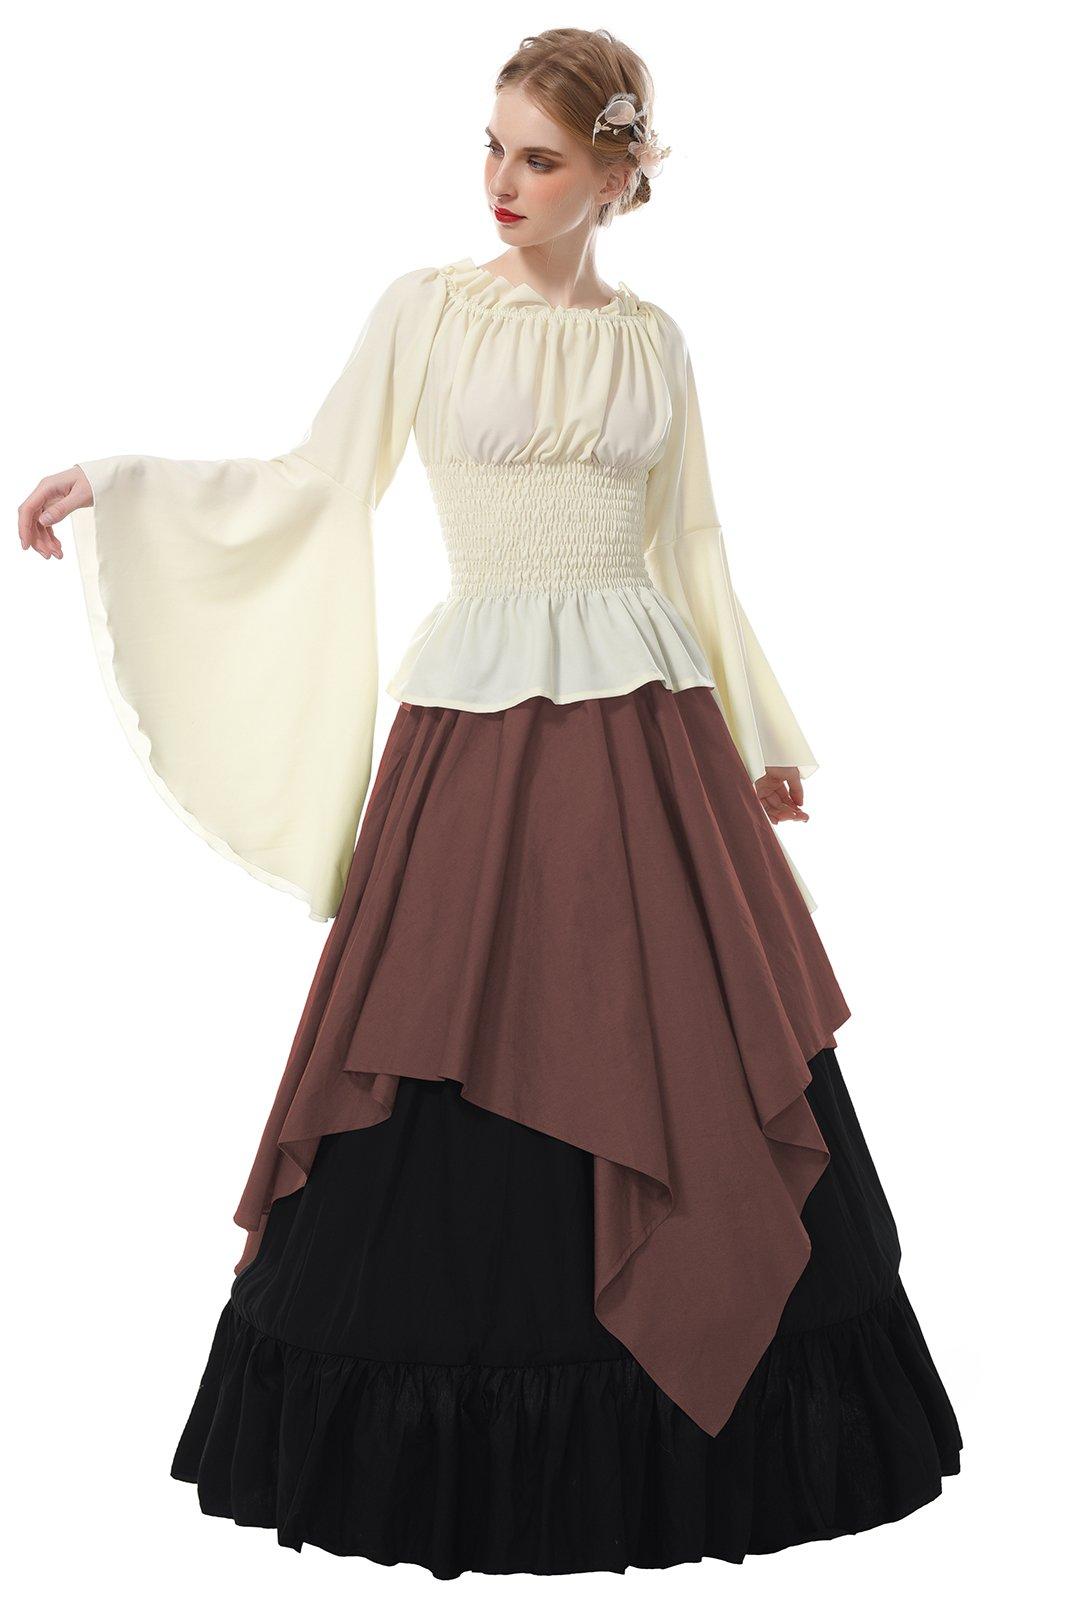 b04dc5306d0b Galleon - ROLECOS Womens Renaissance Medieval Costume Trumpet Sleeve  Peasant Shirt And Skirt Coffee XXL